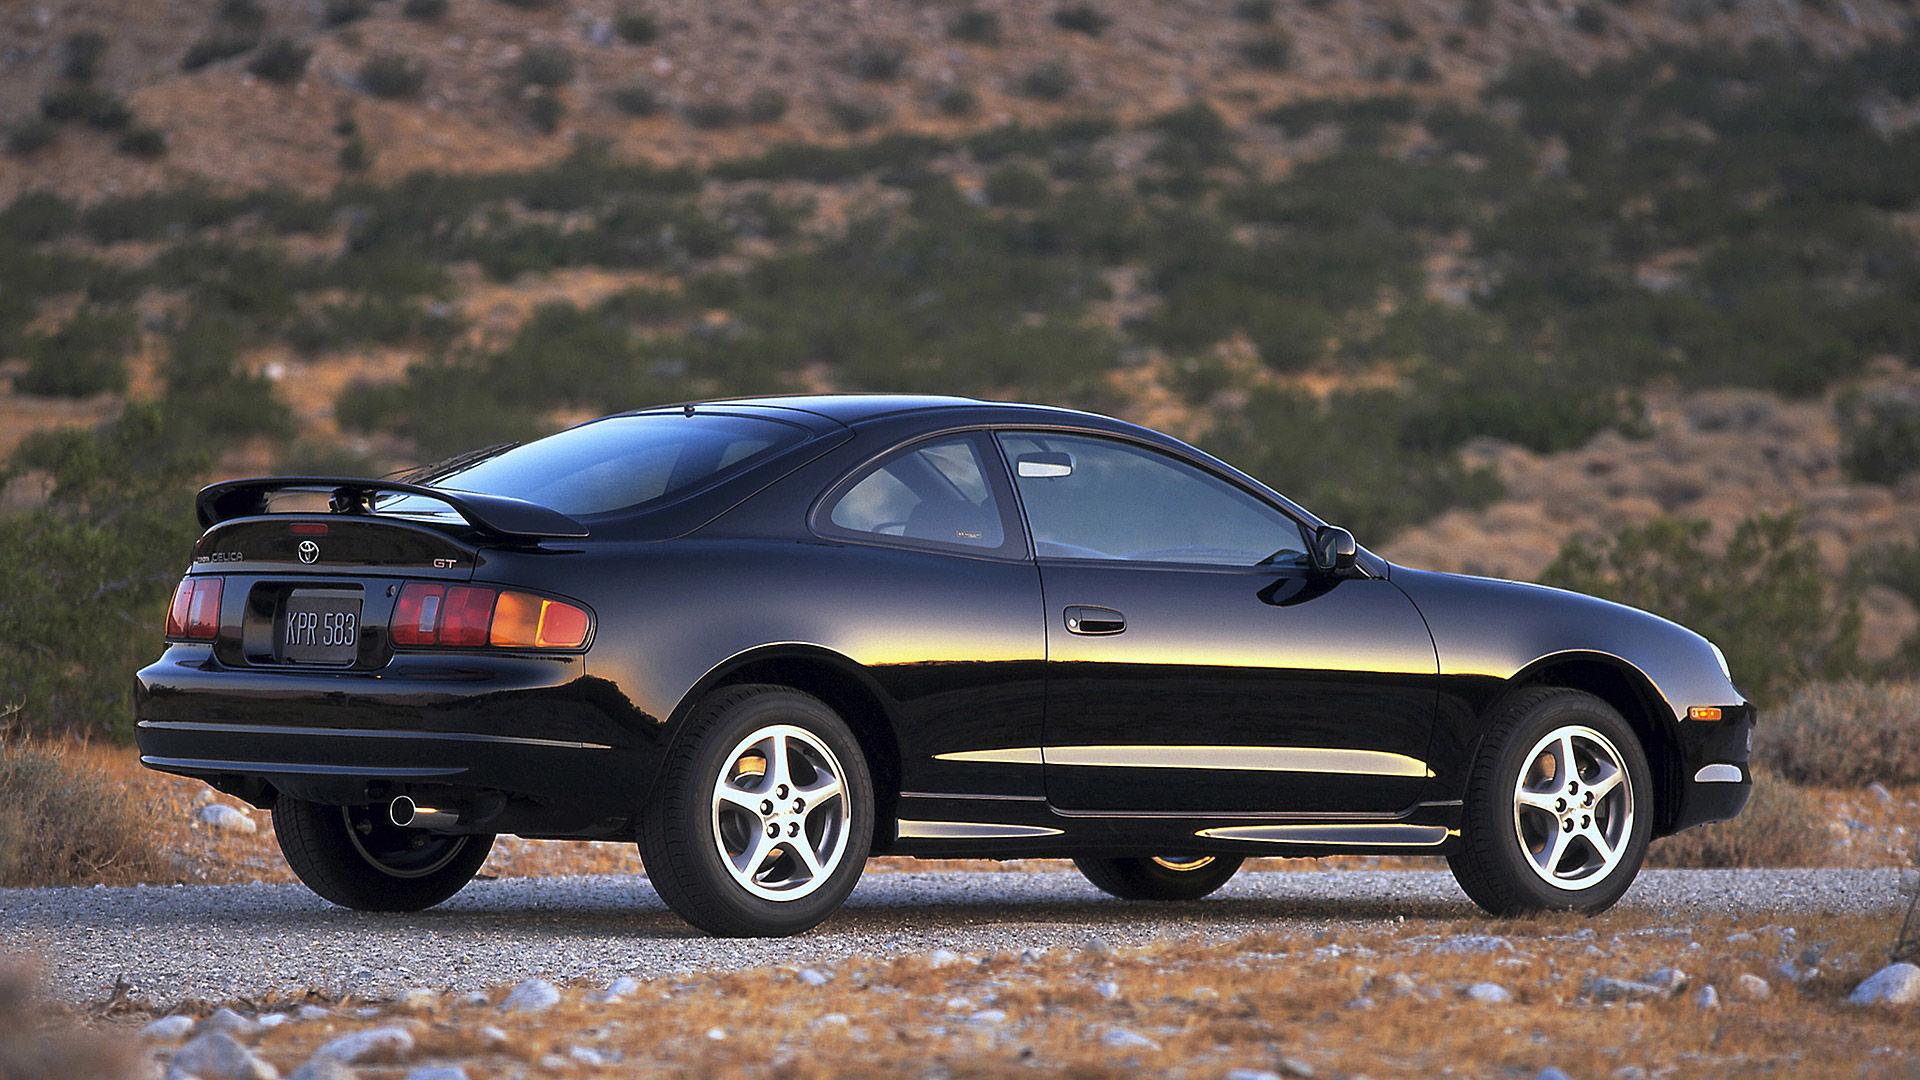 1996 Toyota Celica GT